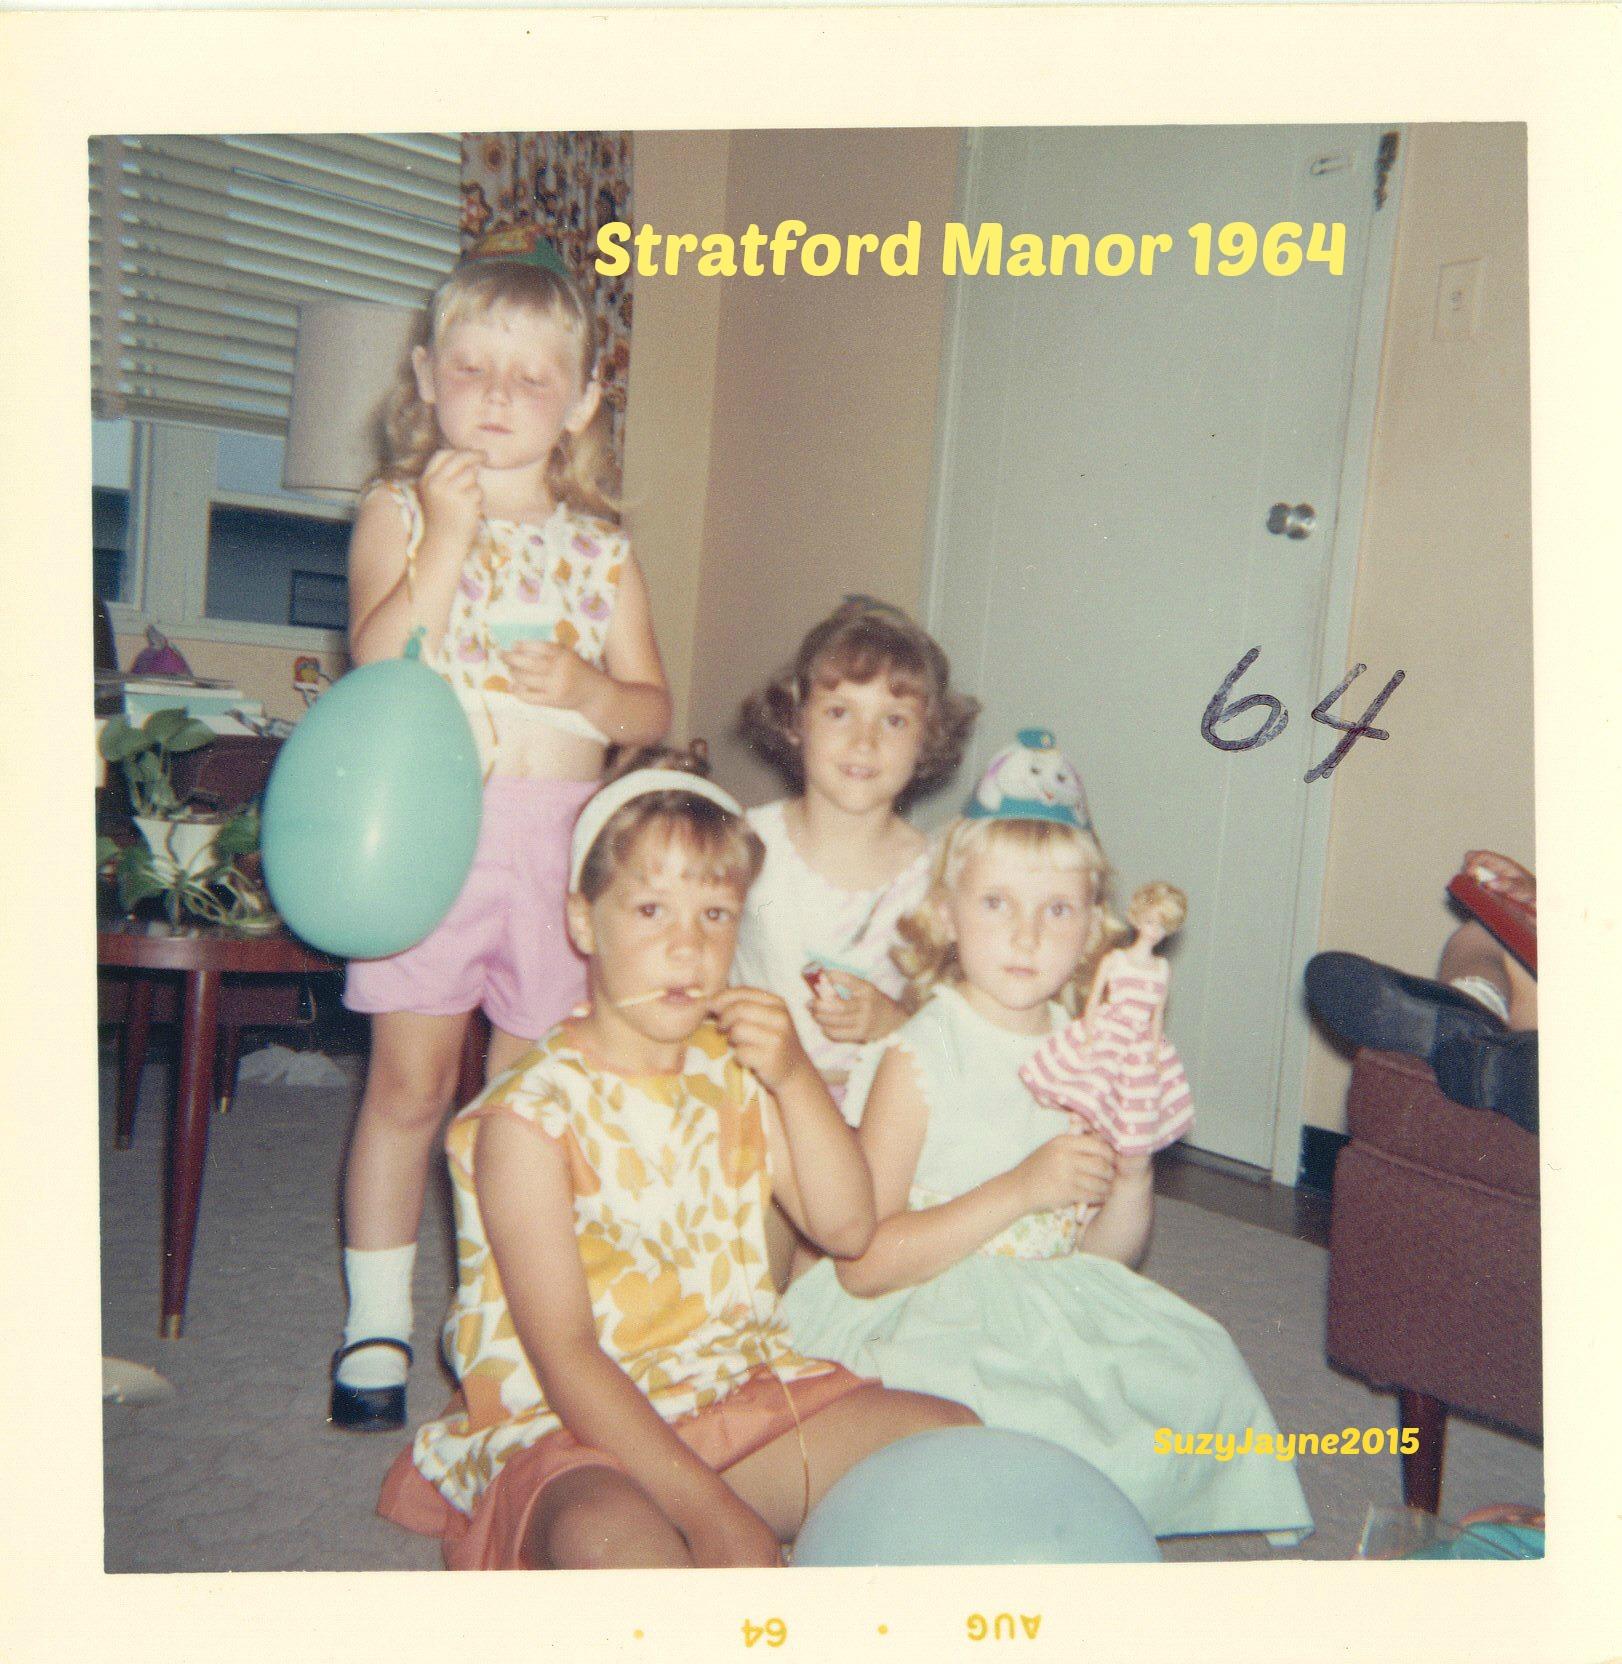 Eastwood Village Apartments: 1950's-1970's Stratford Manor & Eastwood Village (Jackson